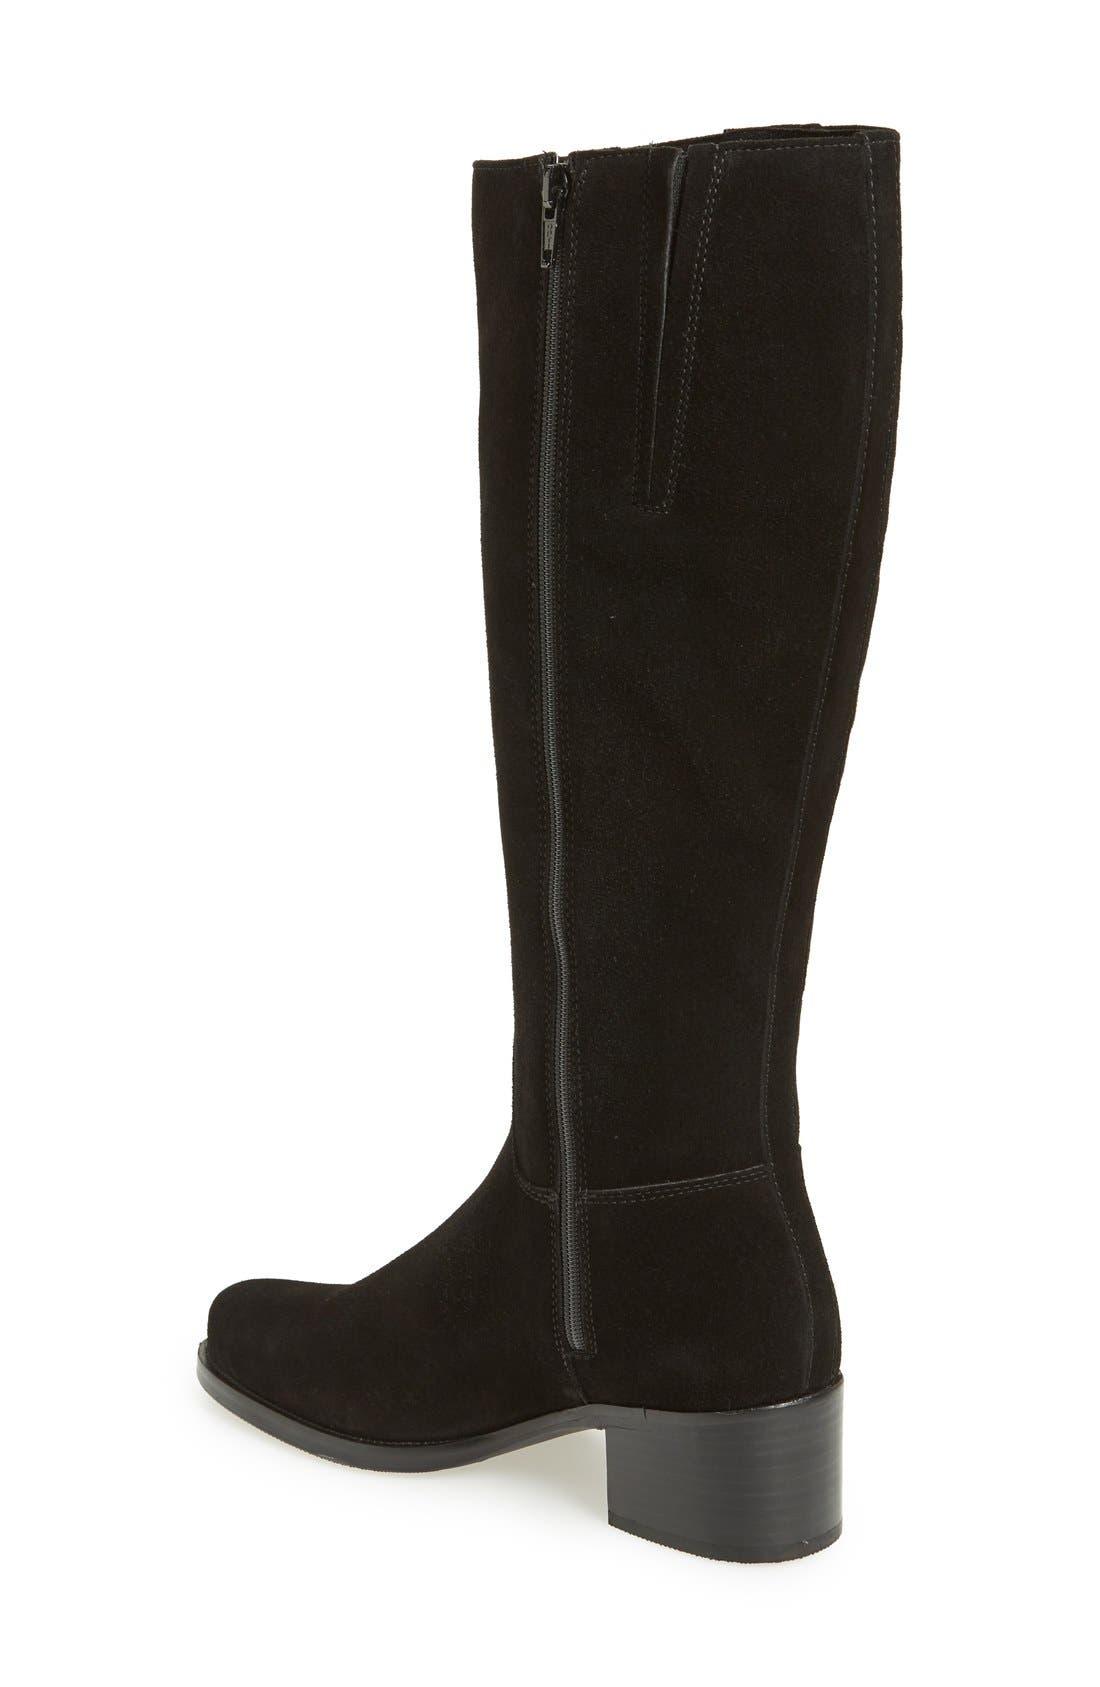 'Polly' Waterproof Knee High Boot,                             Alternate thumbnail 2, color,                             BLACK SUEDE